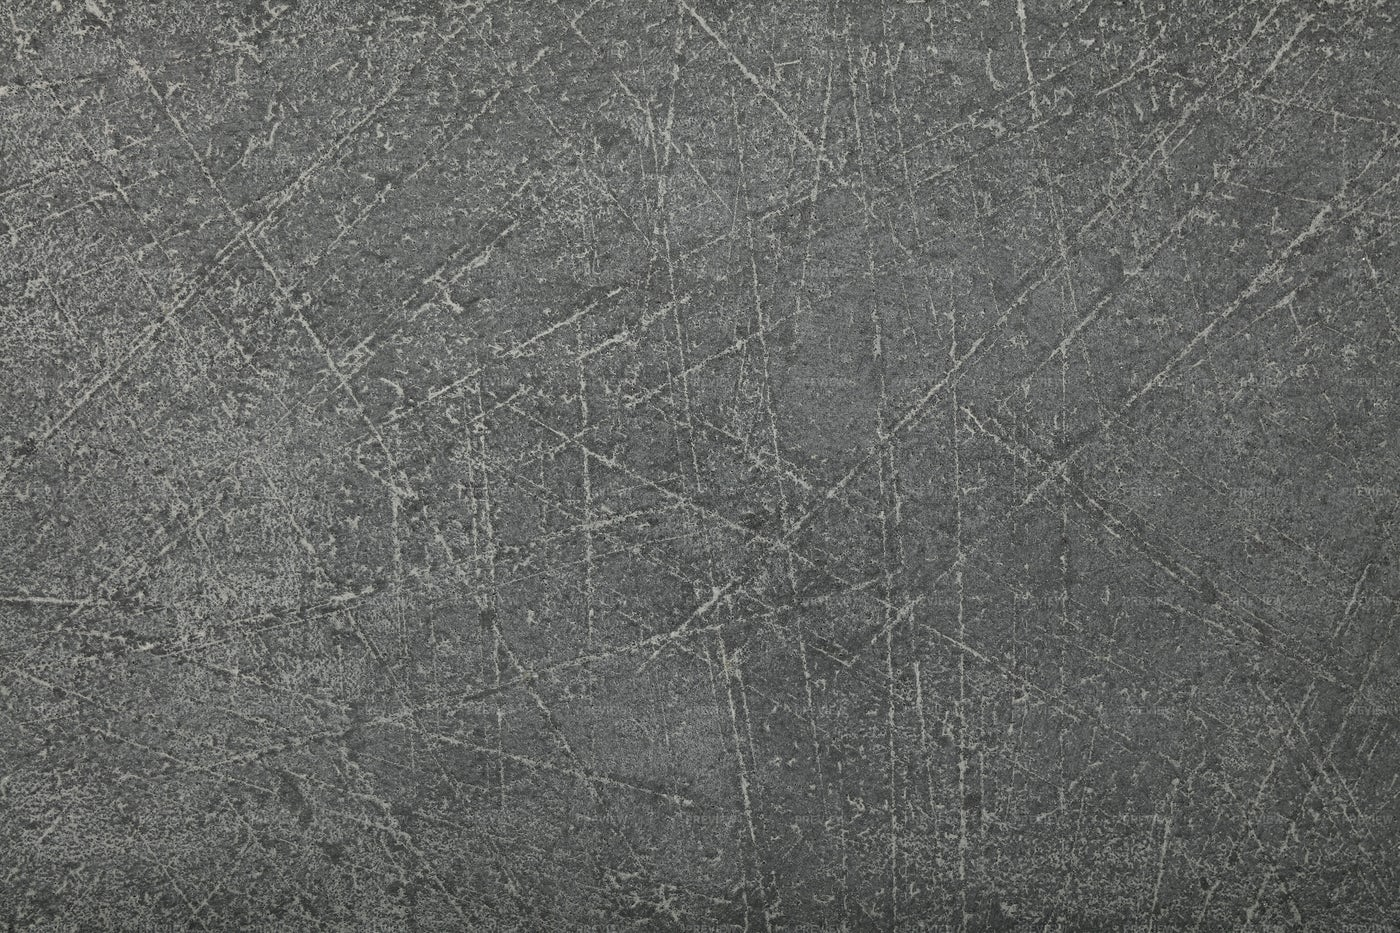 Grunge Uneven Background: Stock Photos